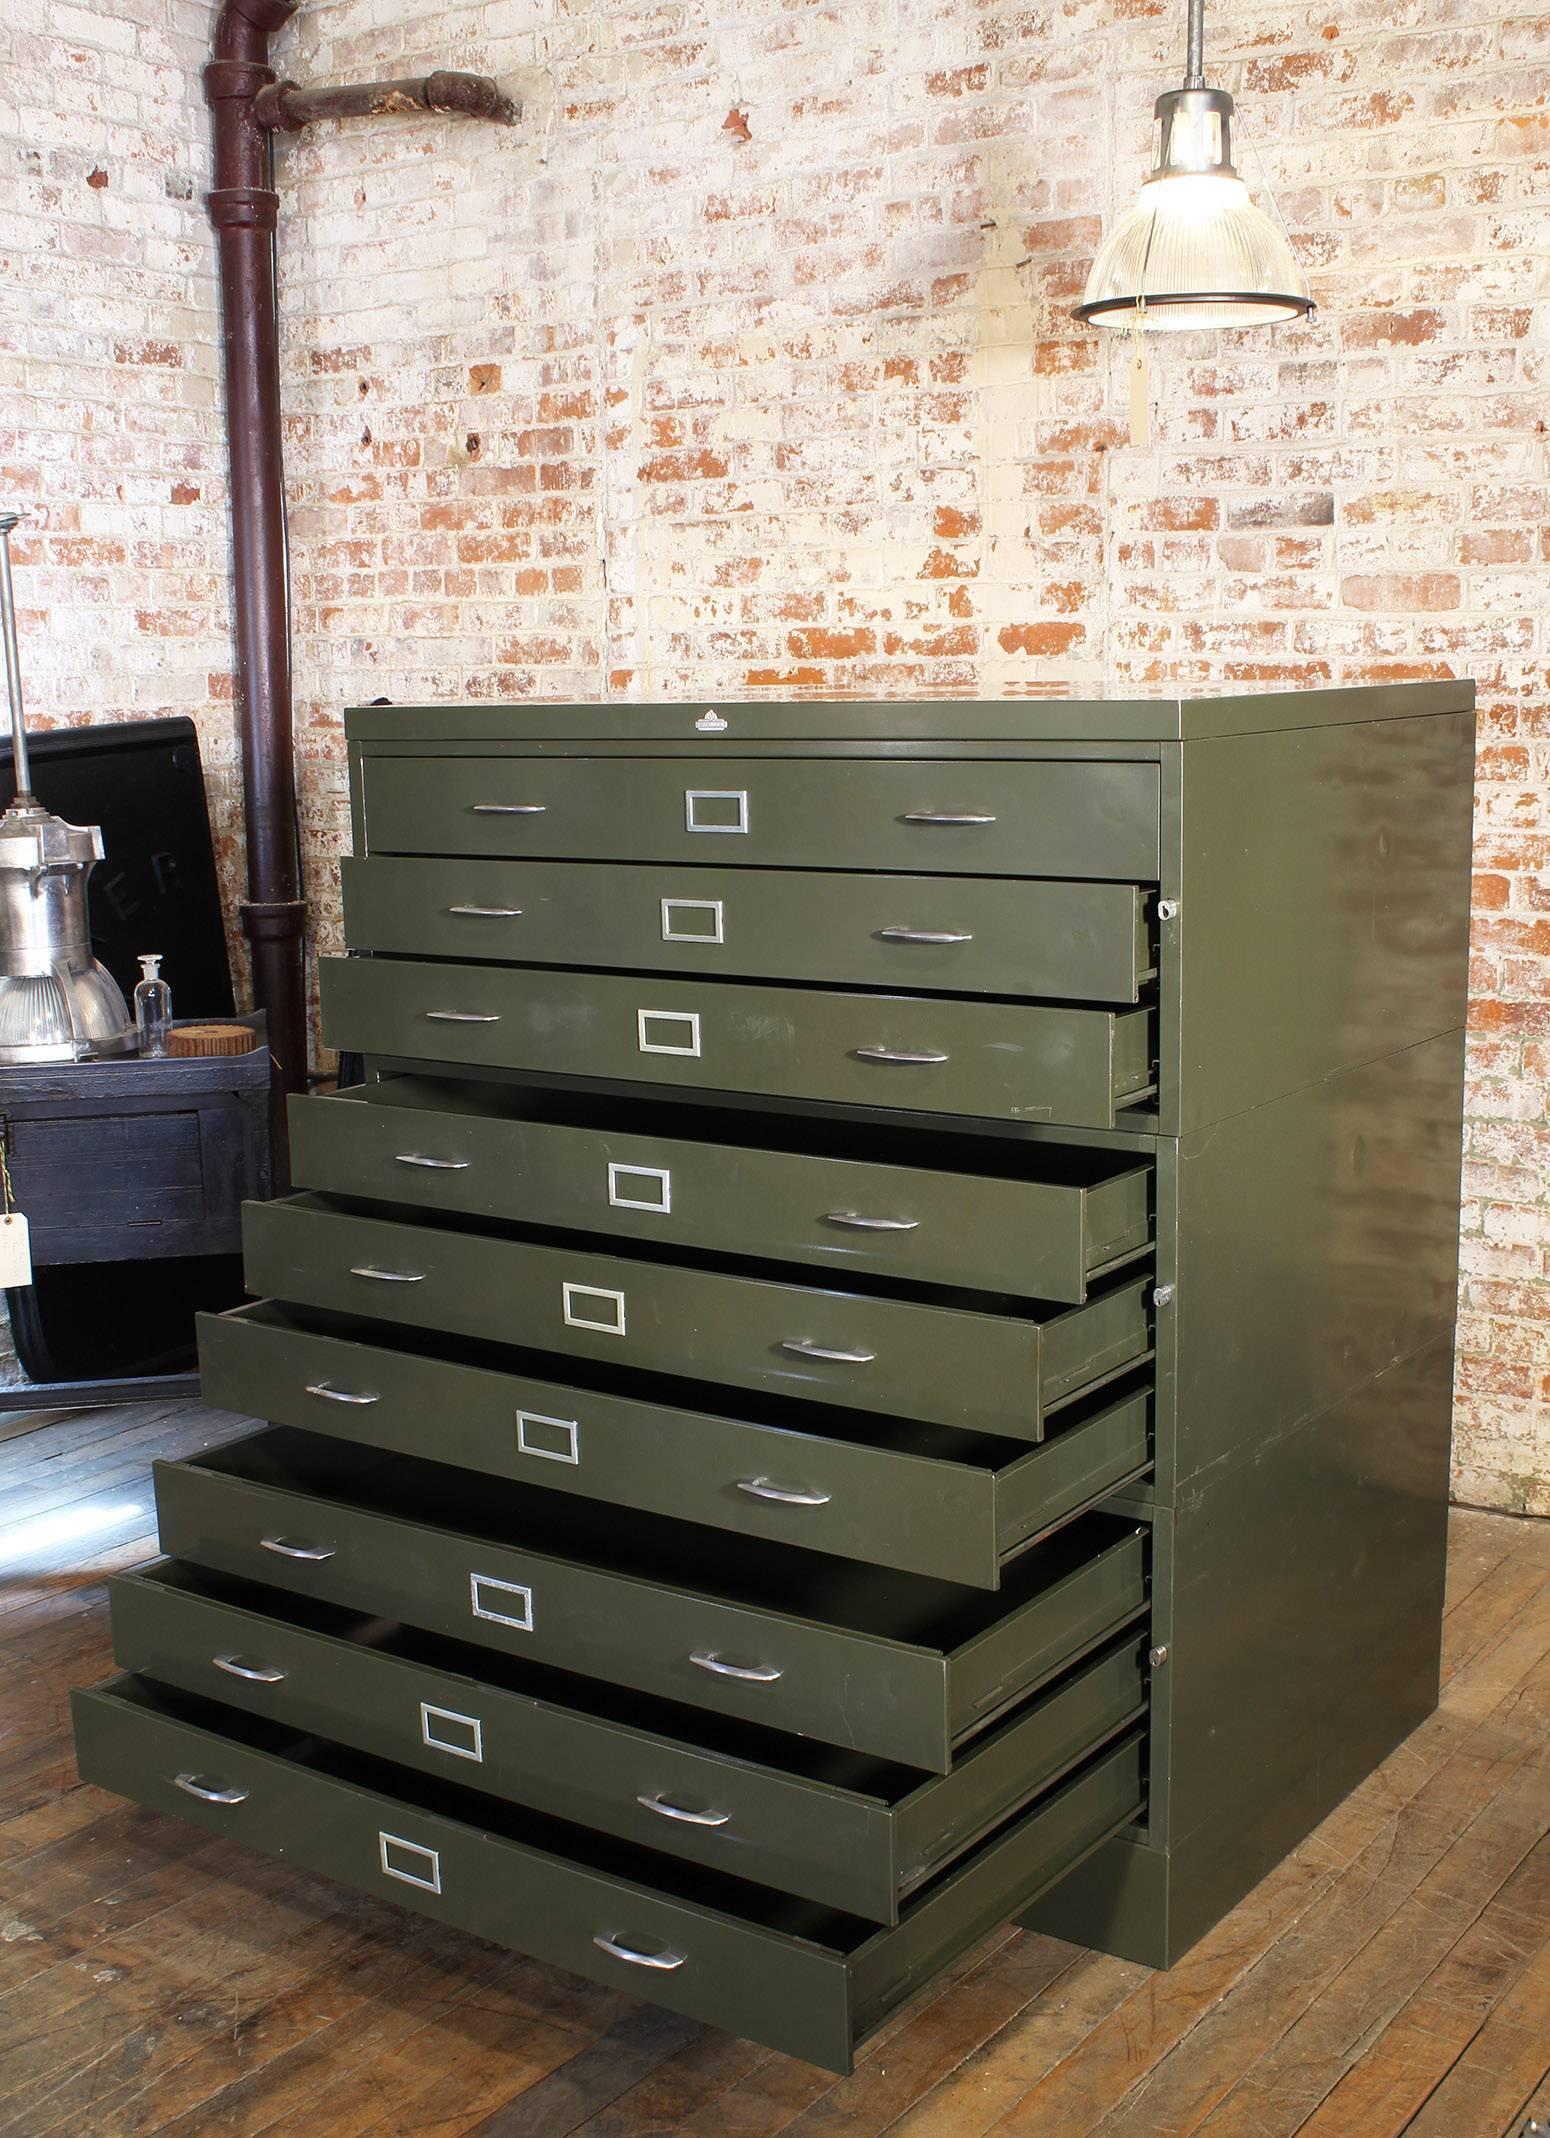 attractive Vintage Metal Filing Cabinet For Sale Part - 10: Industrial Vintage All-Steel Flat File Storage Cabinet For Sale